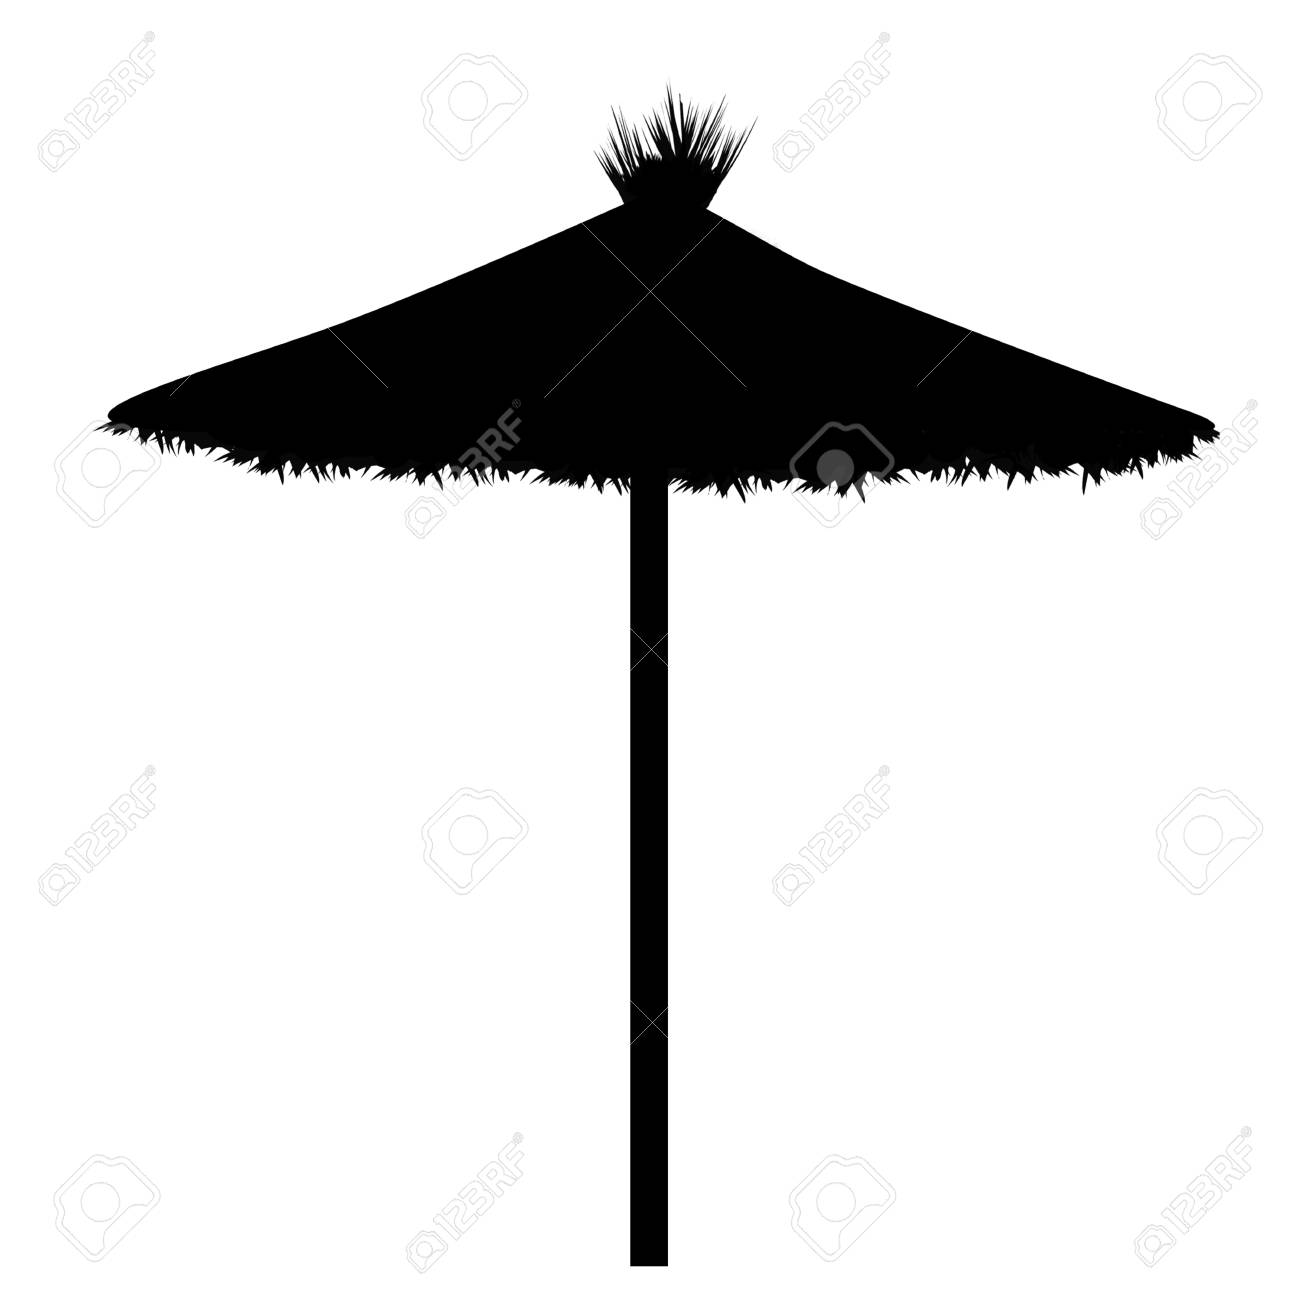 Beach umbrella silhouette on white background, vector illustration.